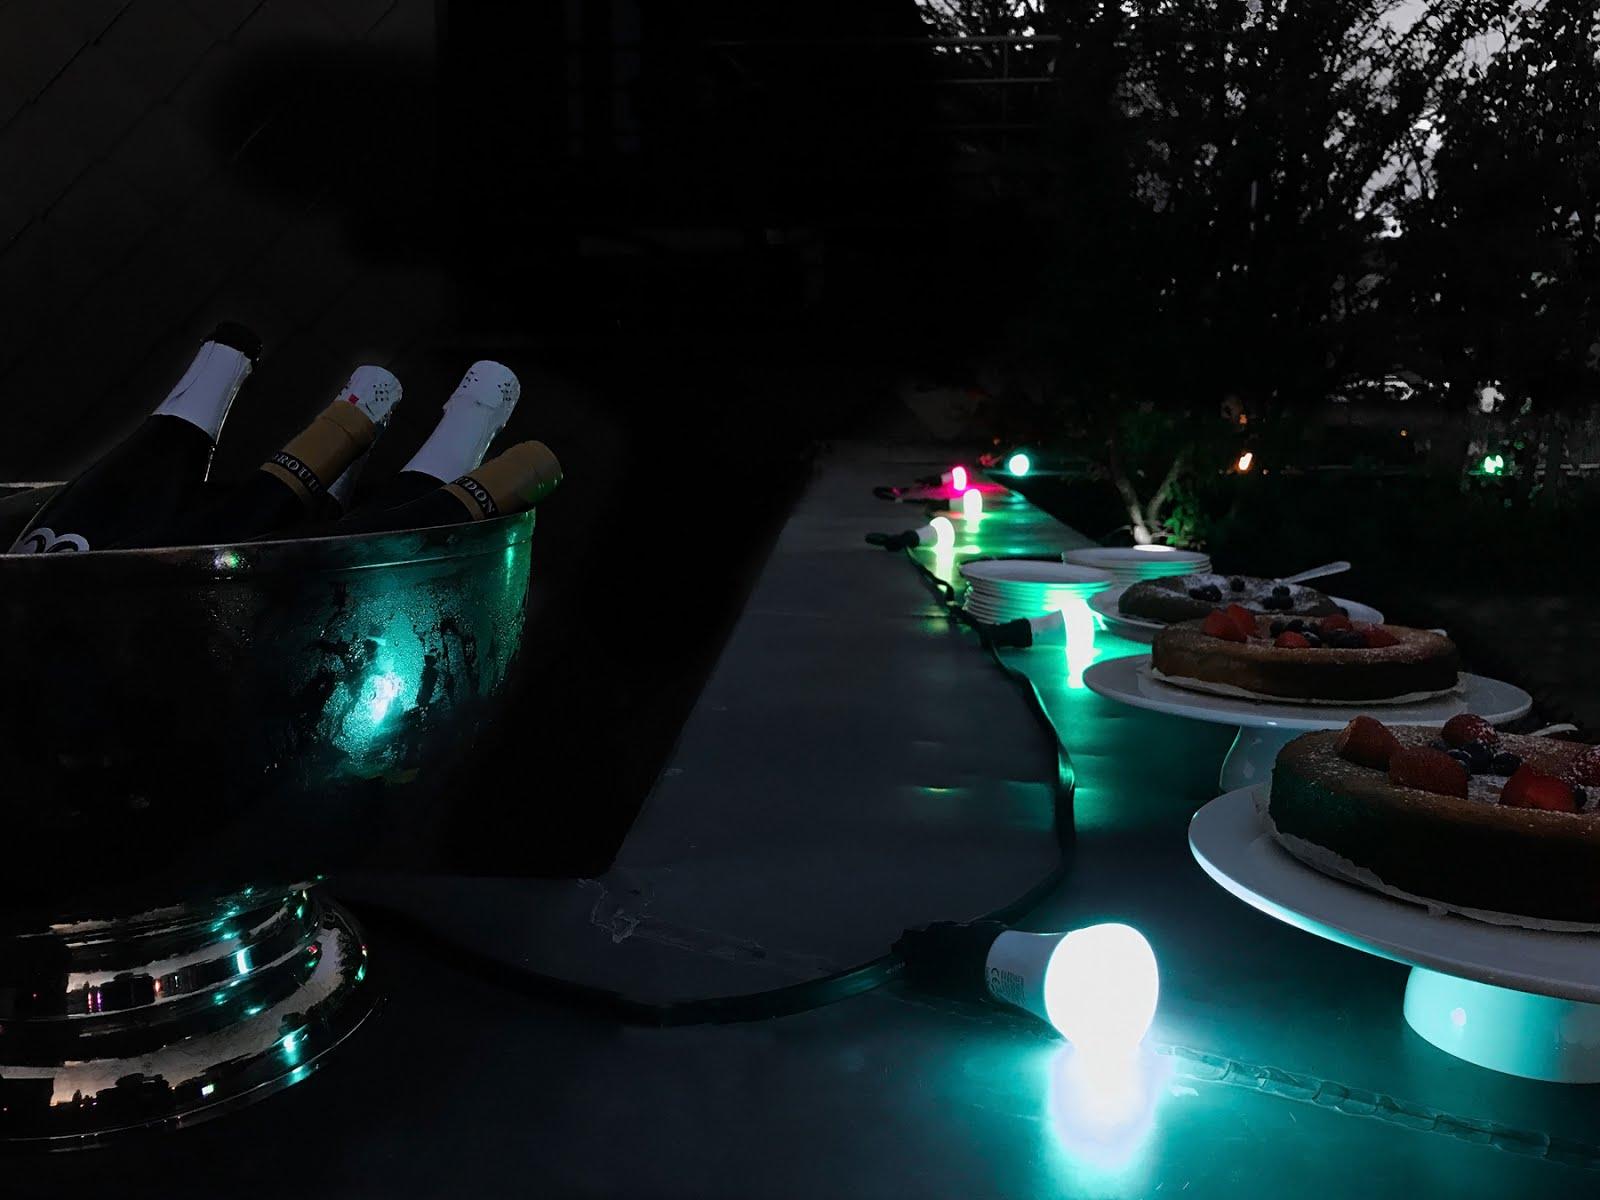 Philips hue, wireless light, wellbeing, event, hotel julien antwerp, rooftop party